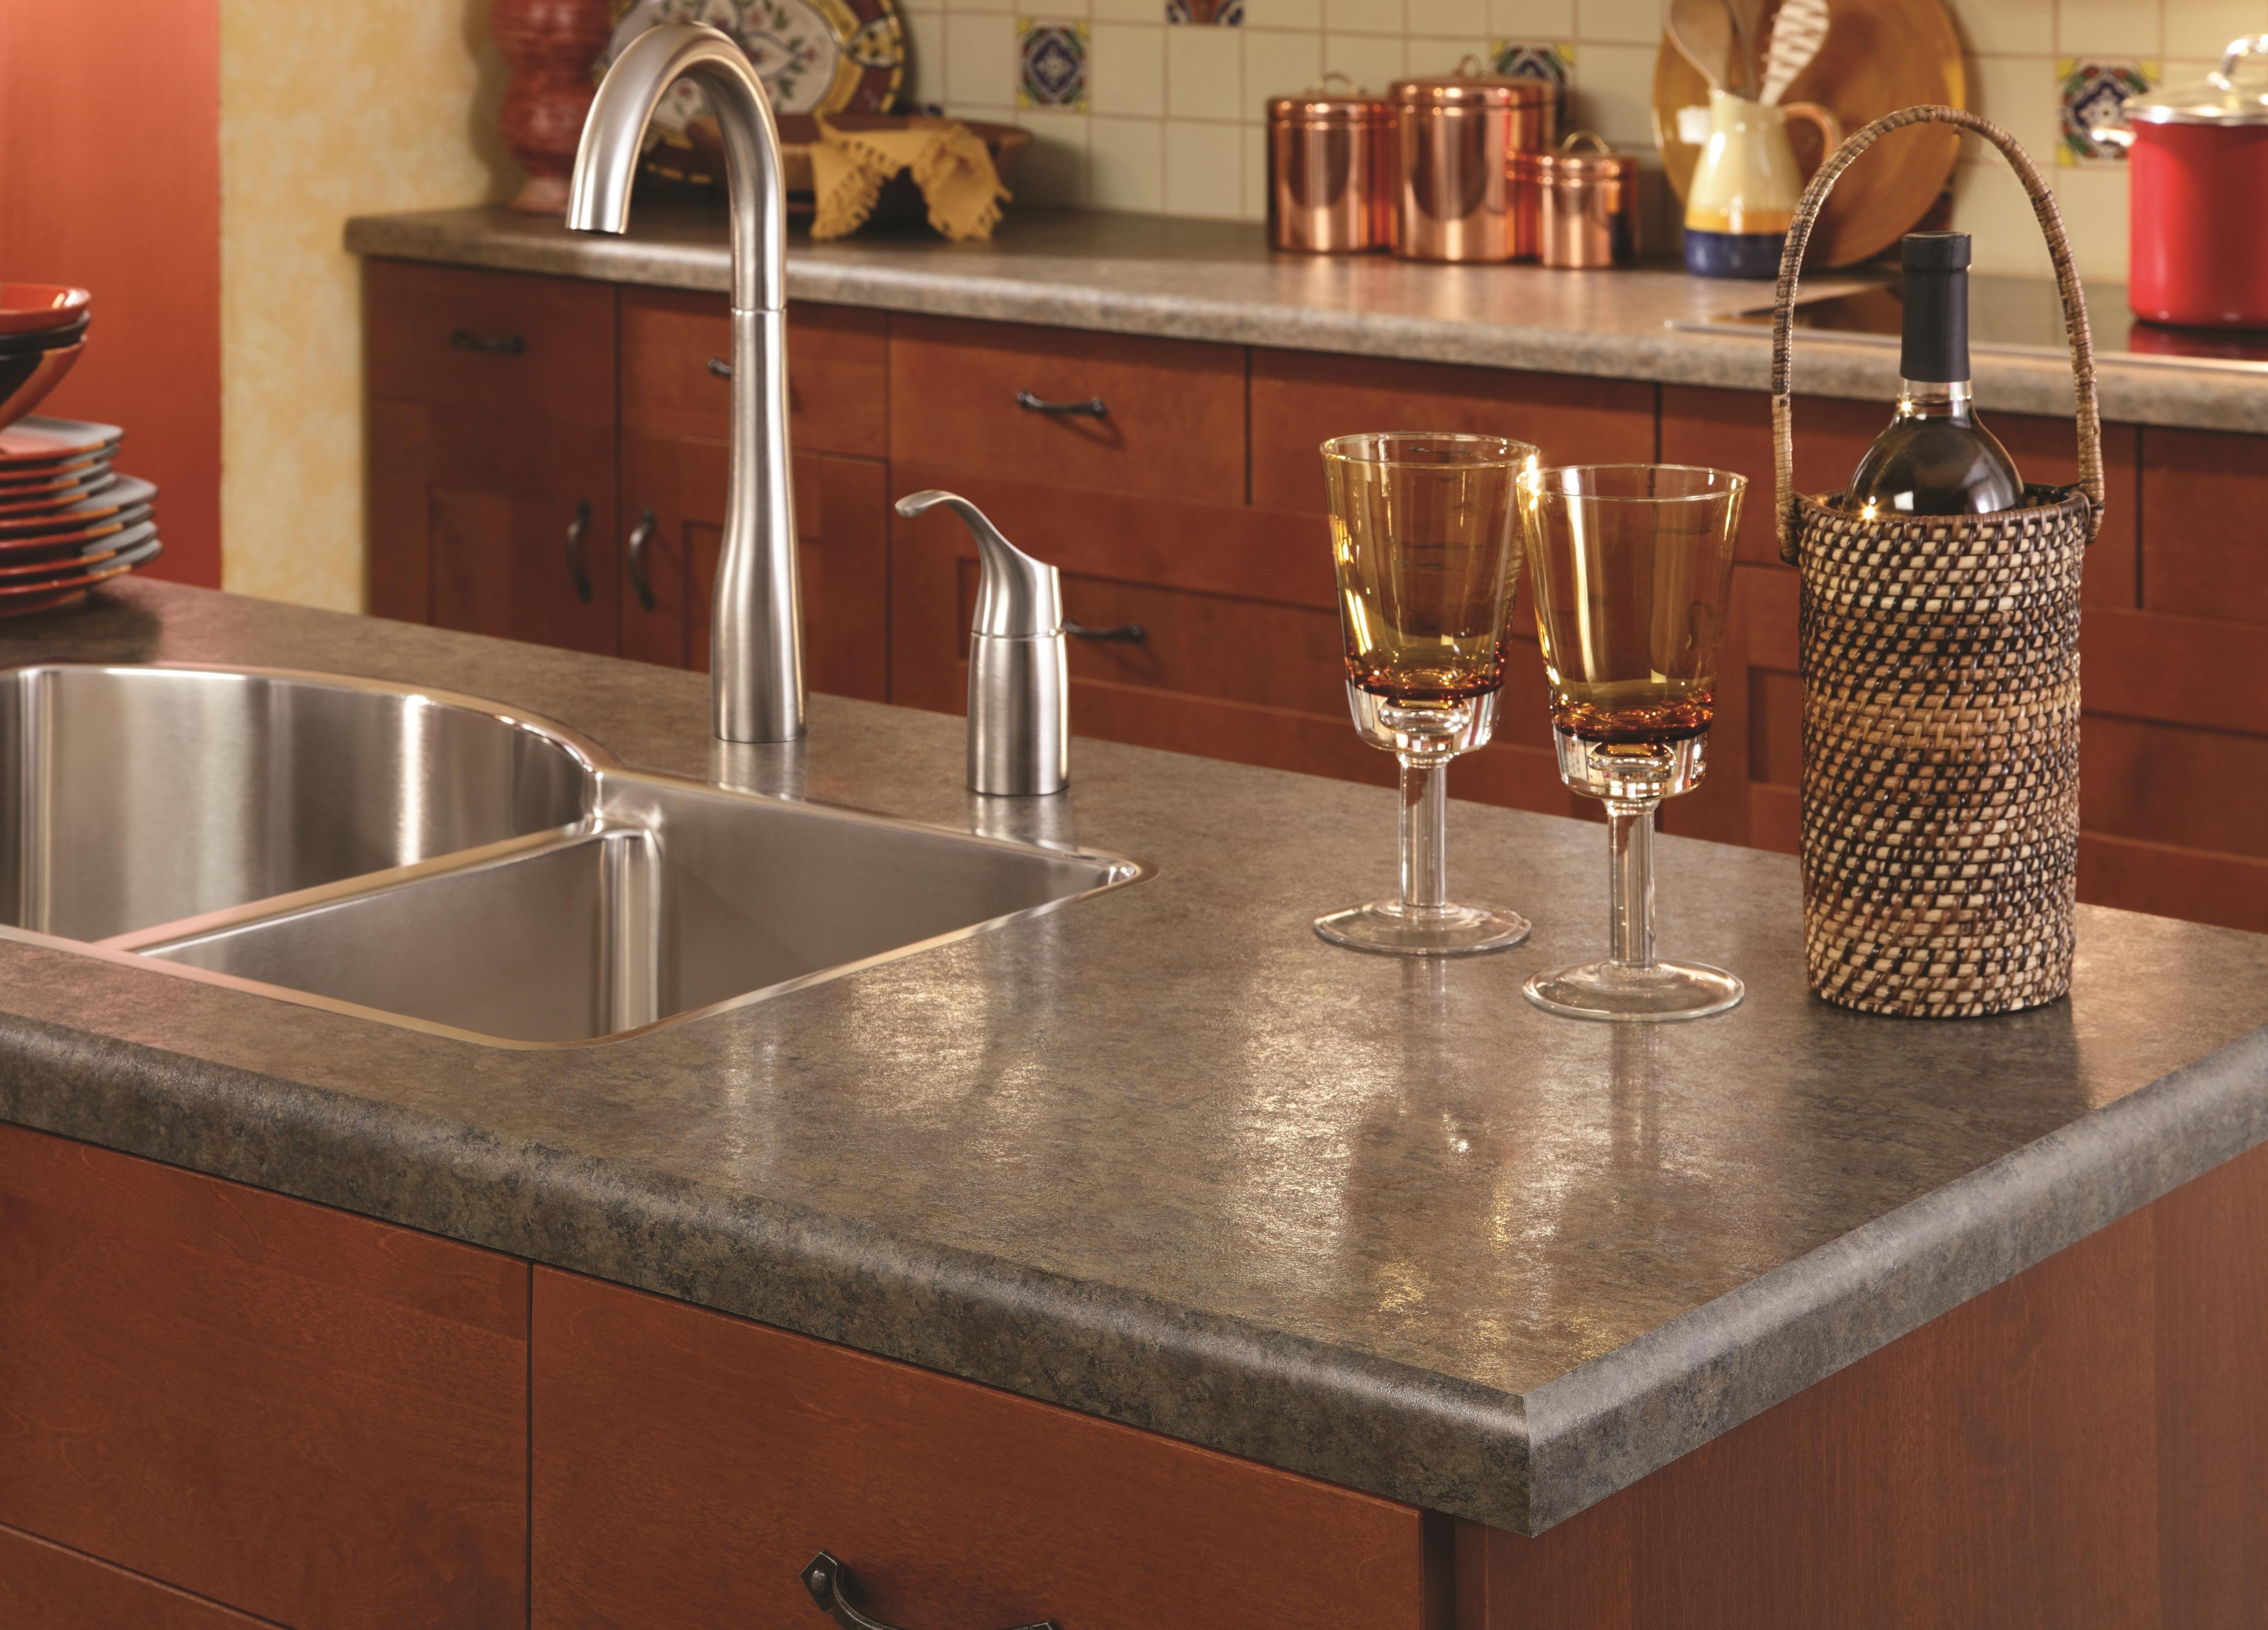 Wilsonart Laminate Kitchen Countertops Wilsonart® Hd® Laminate Counter Top  Wilsonart Llc & Alpine